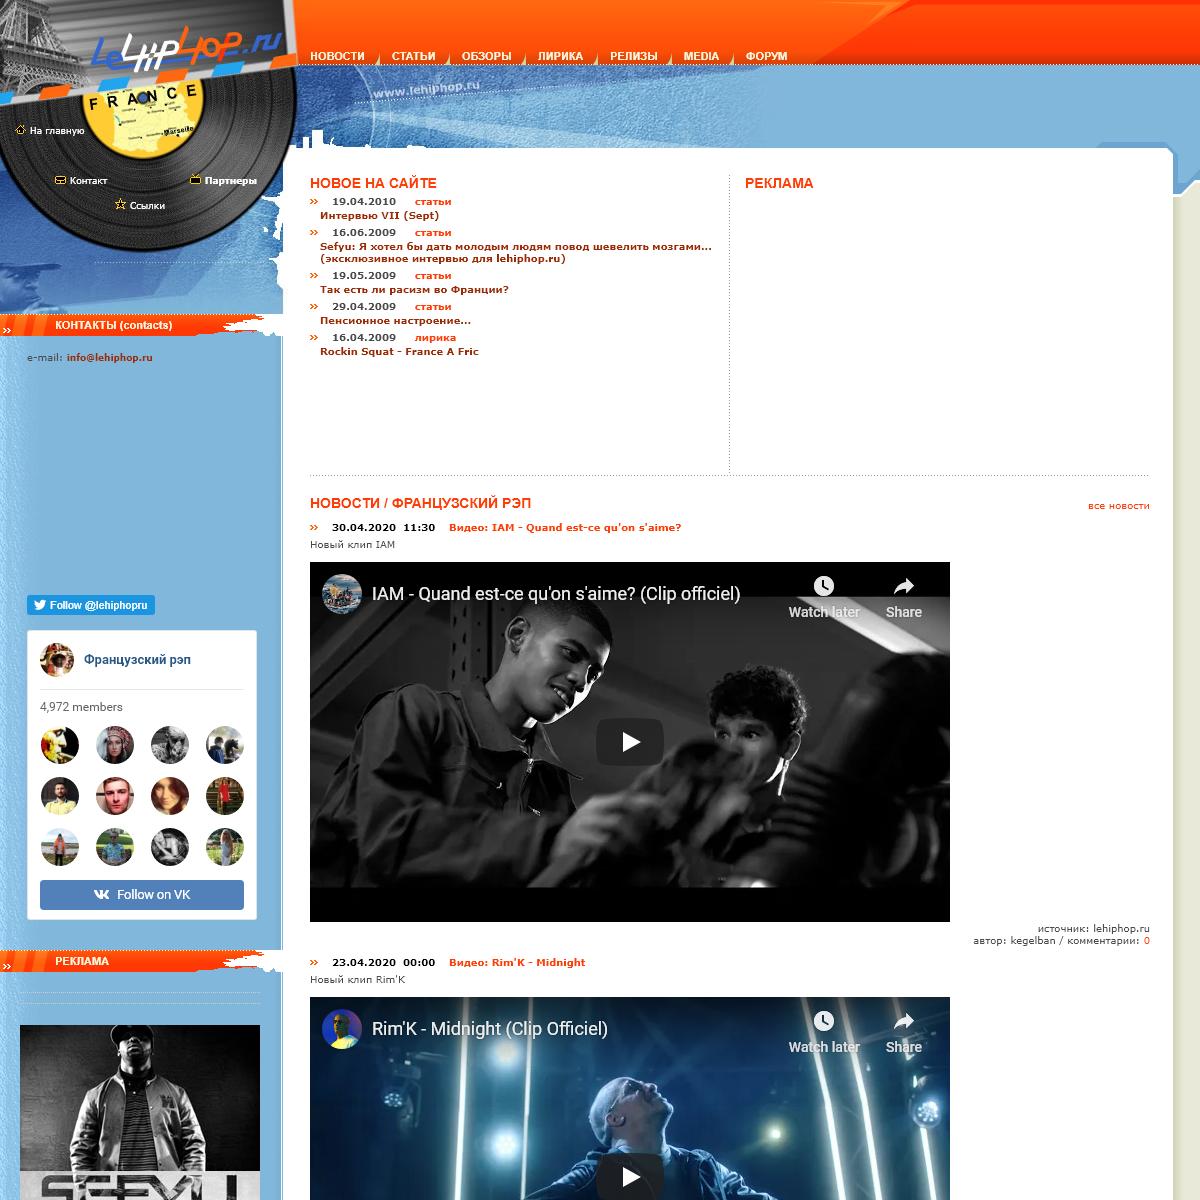 Новости - французский рэп - lehiphop.ru